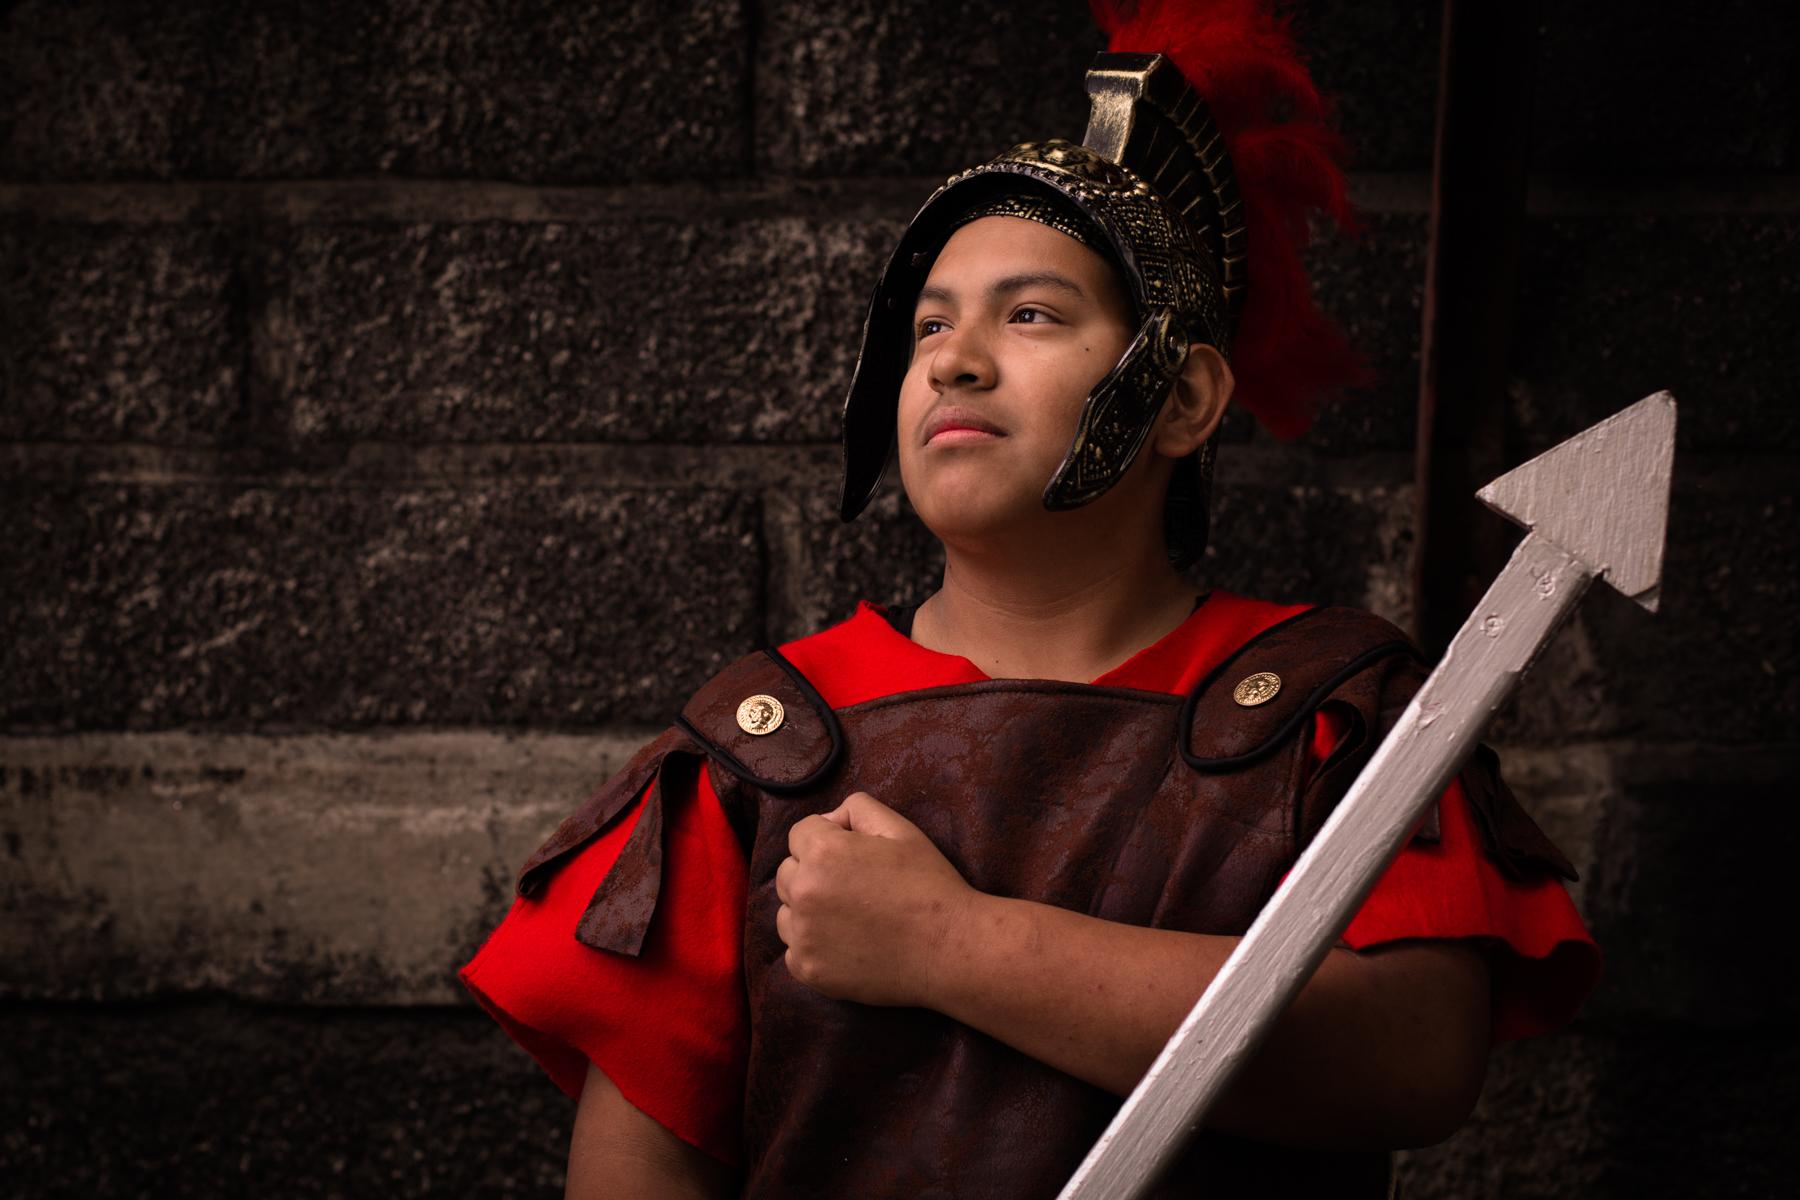 Proud Centurion